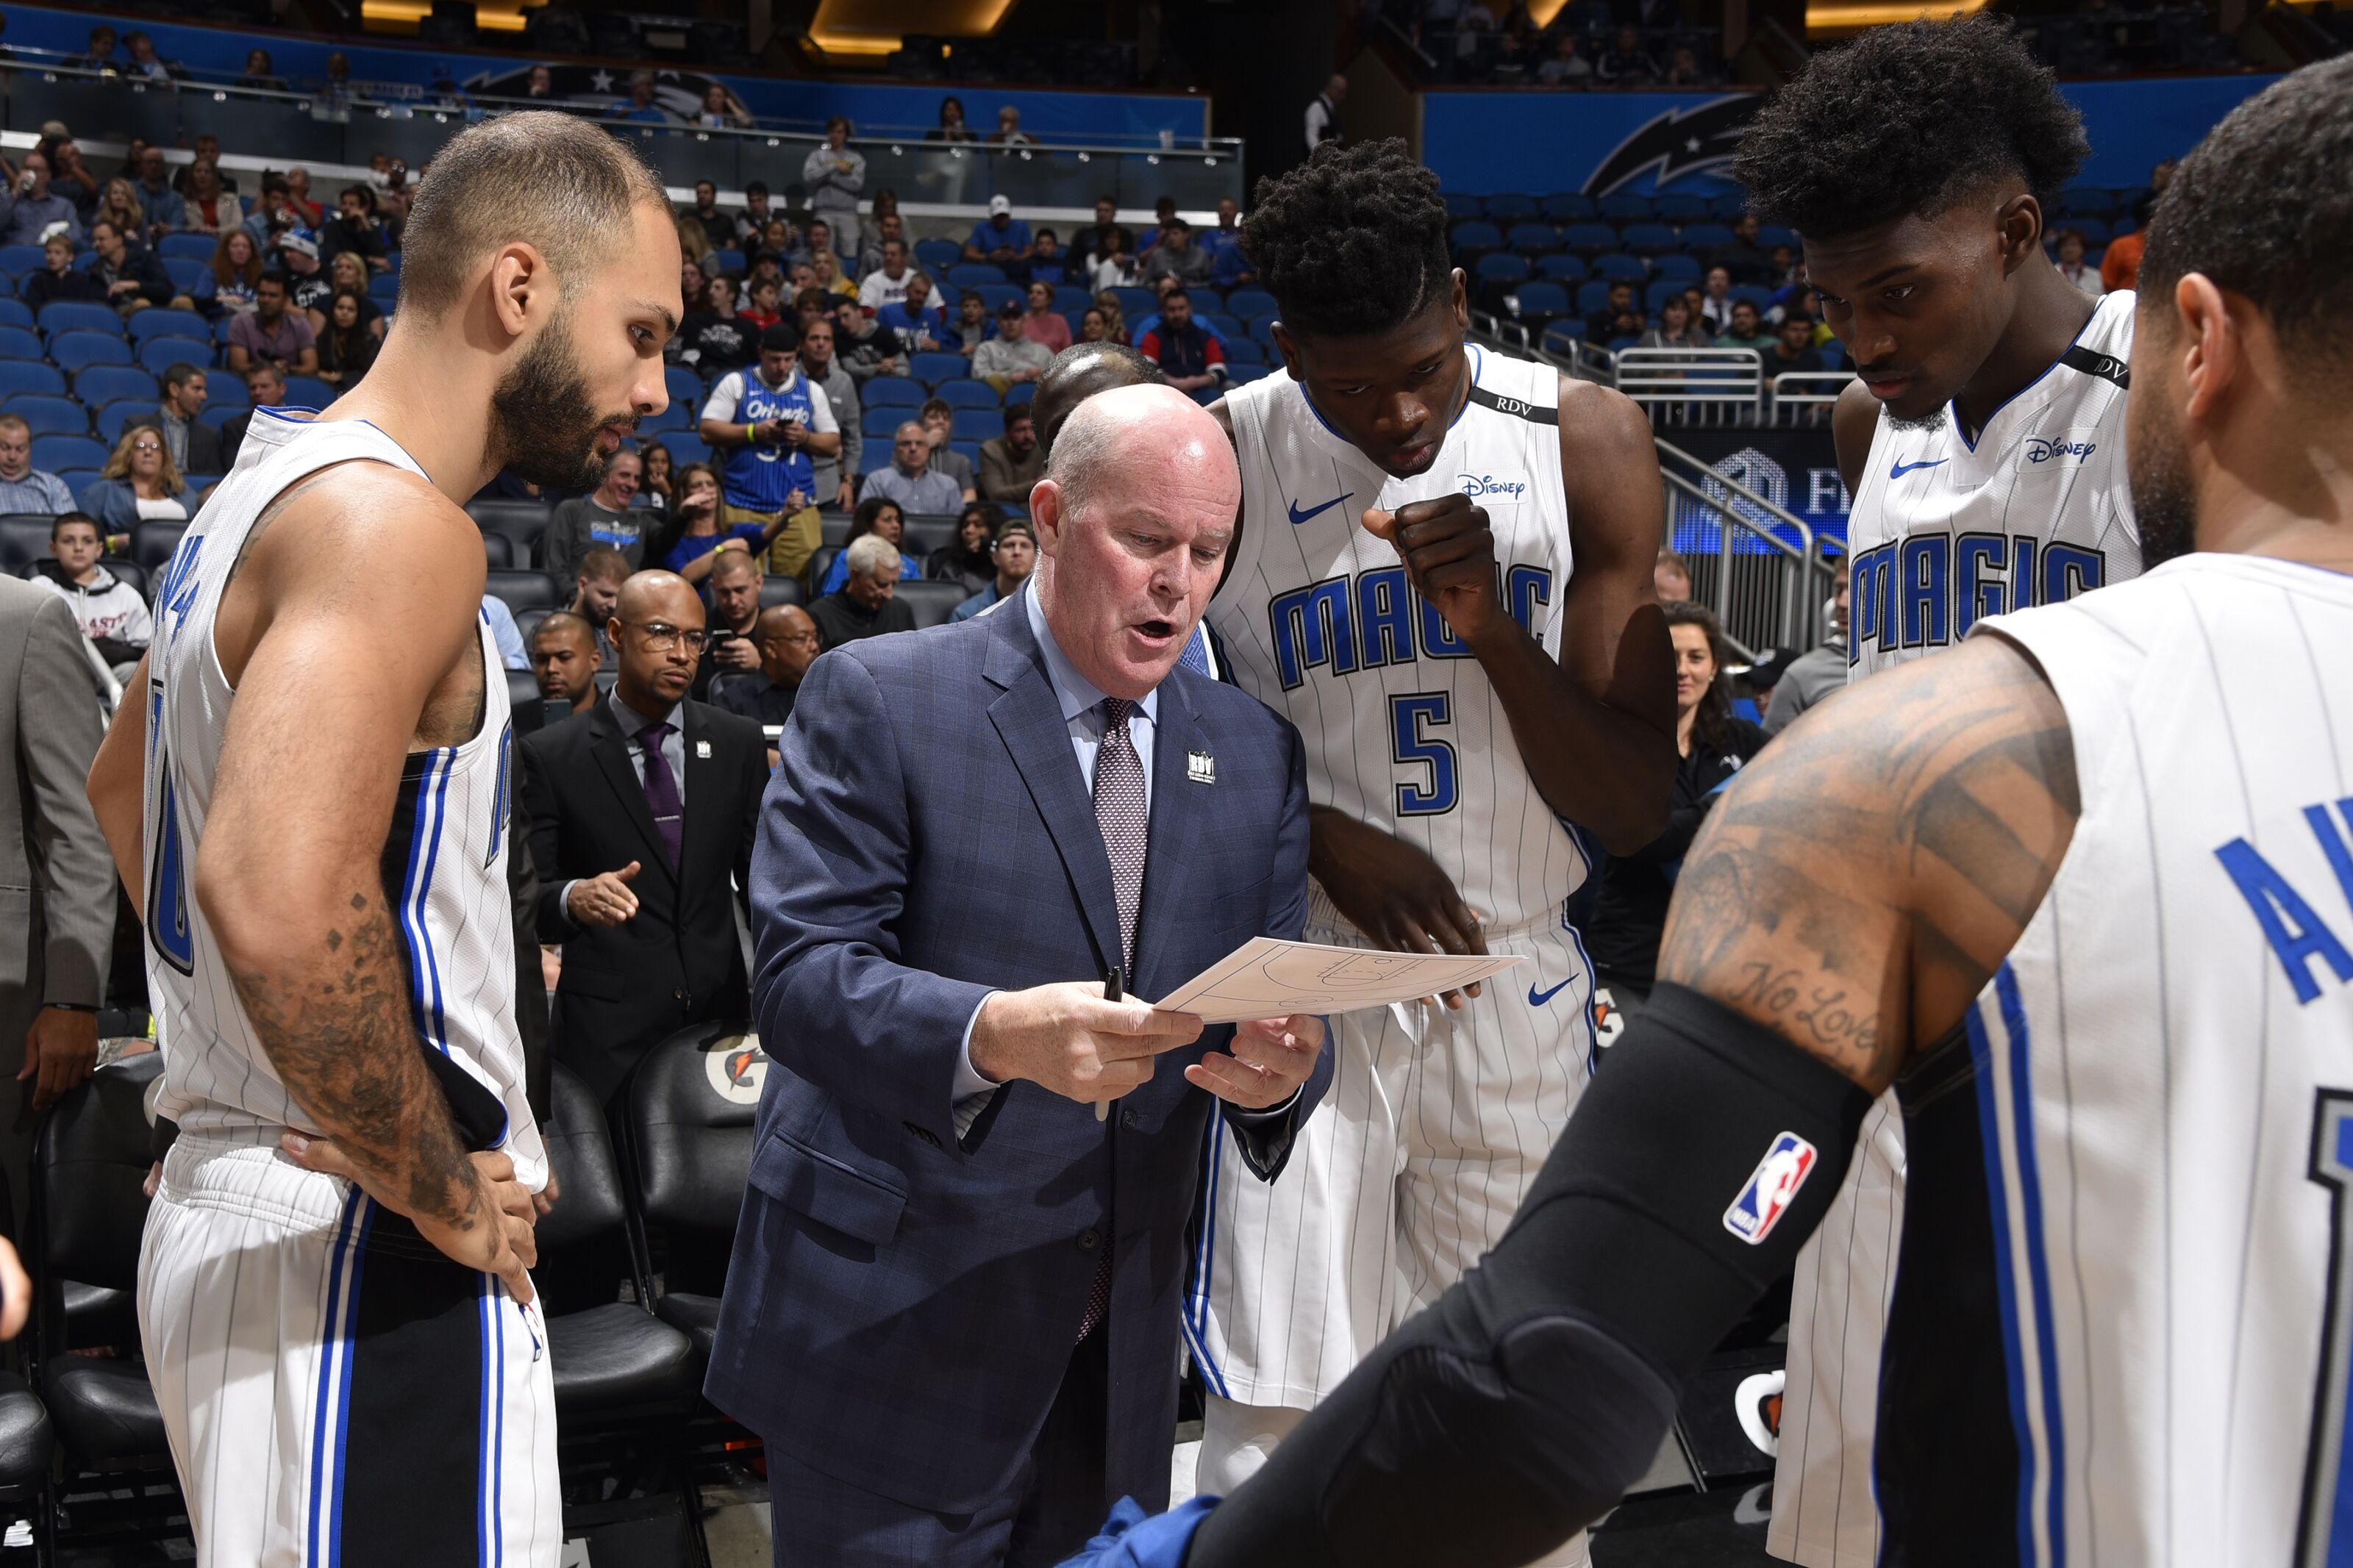 Orlando Magic's surge matching Steve Clifford's Charlotte Hornets turnaround